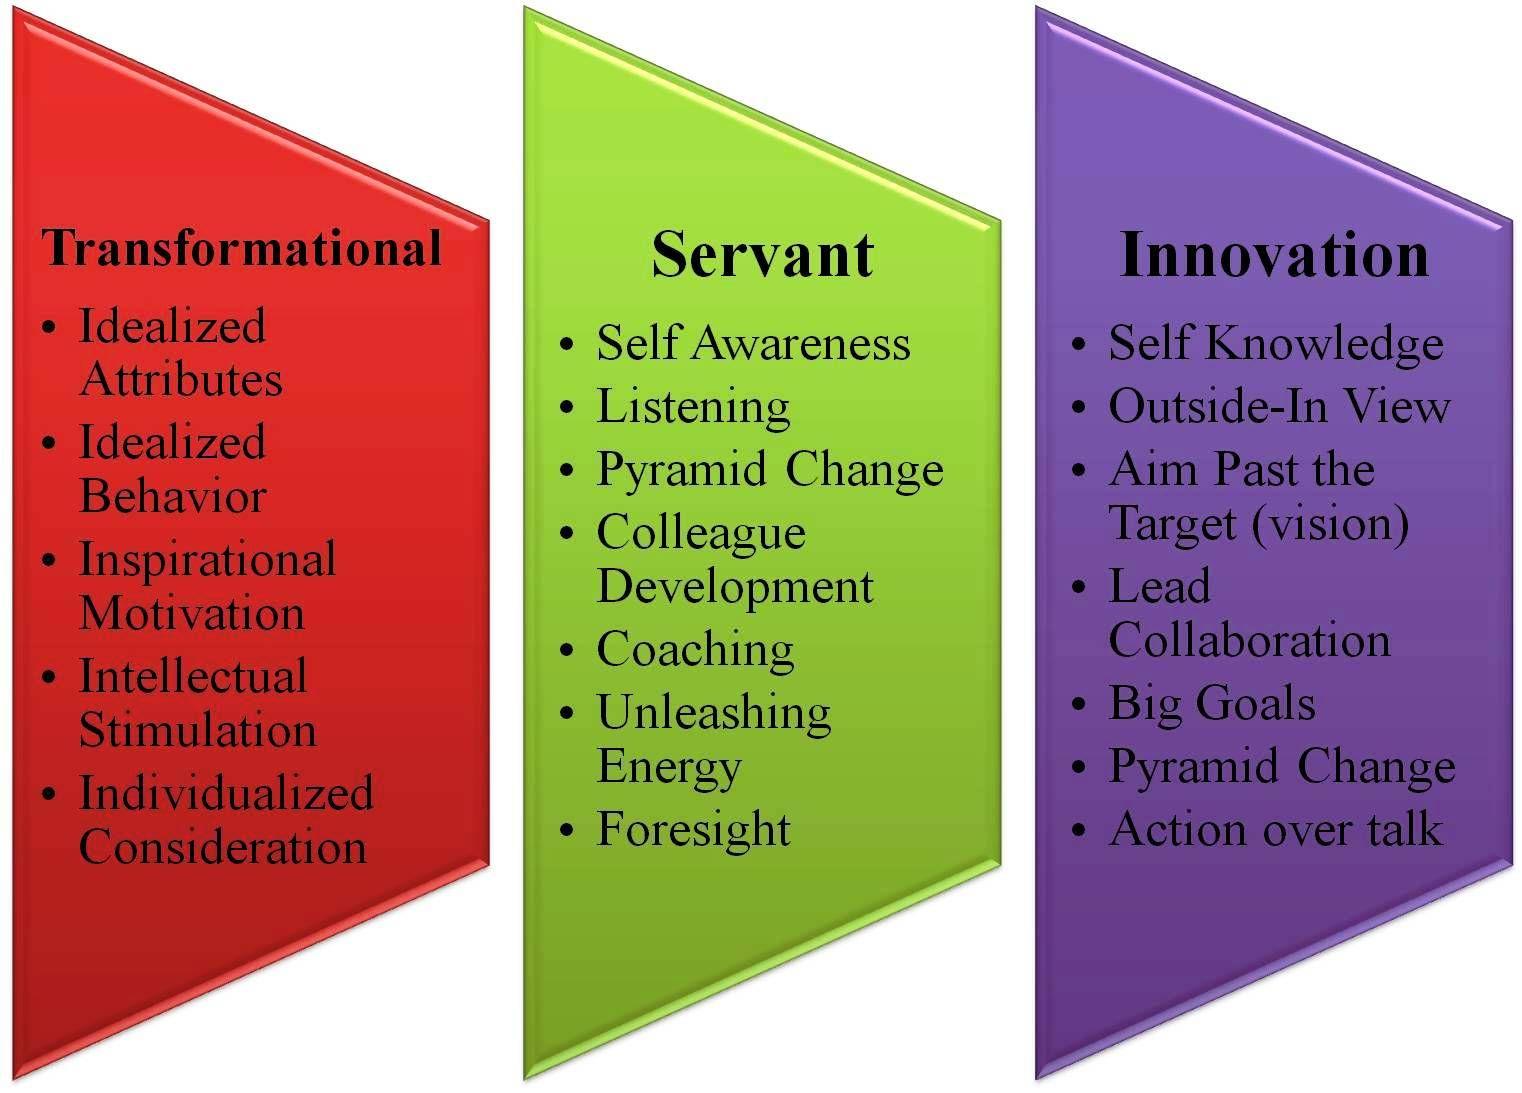 3 leadership styles - transformational servant leadership innovation